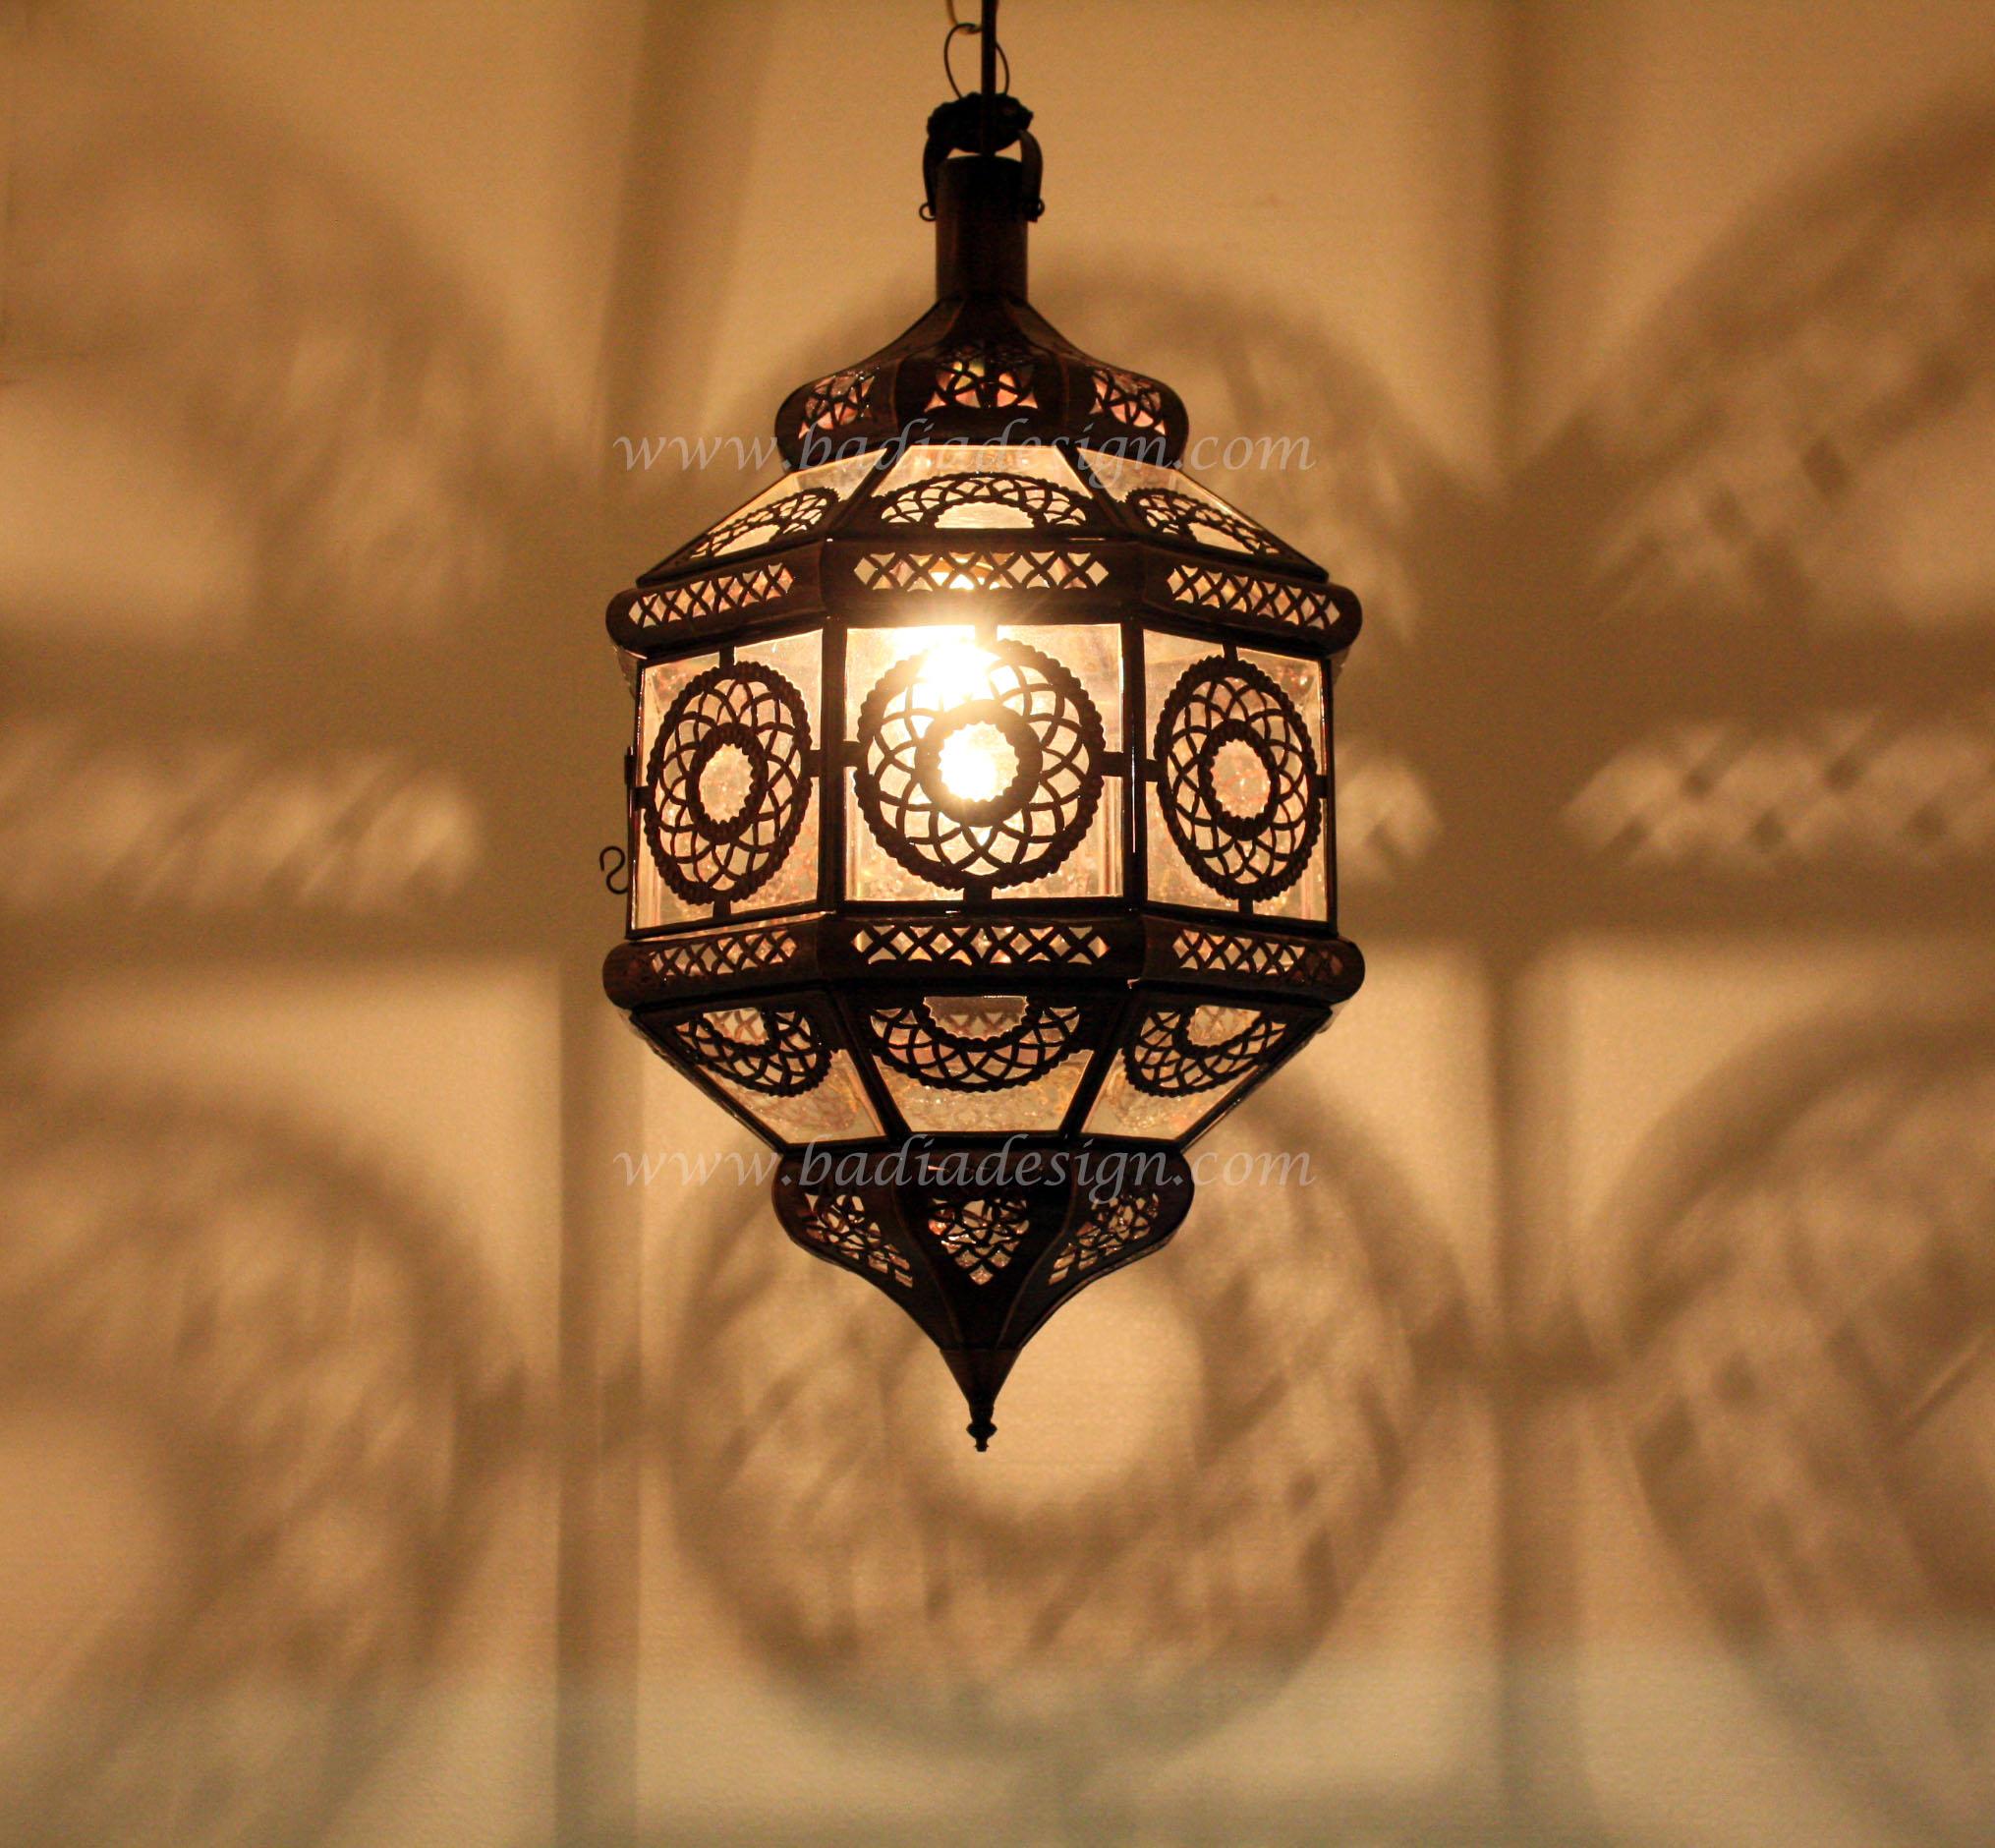 moroccan-interior-lighting-lig147-2.jpg